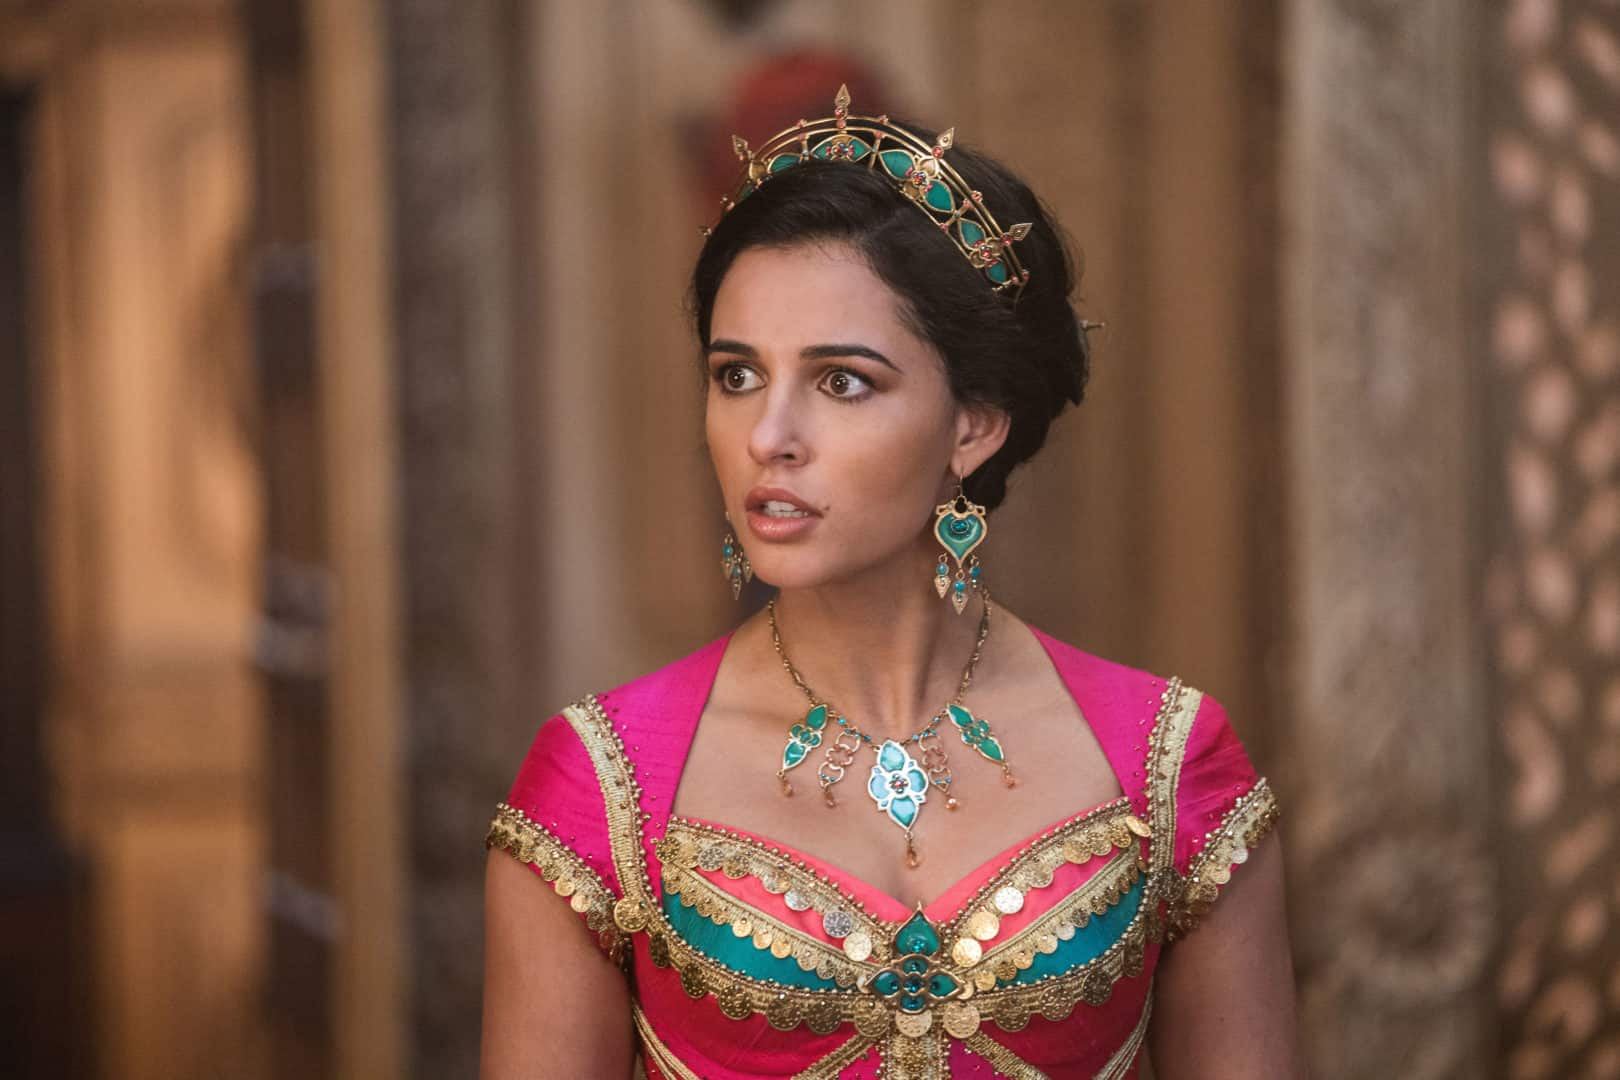 Aladdin 2019 Naomi Scott